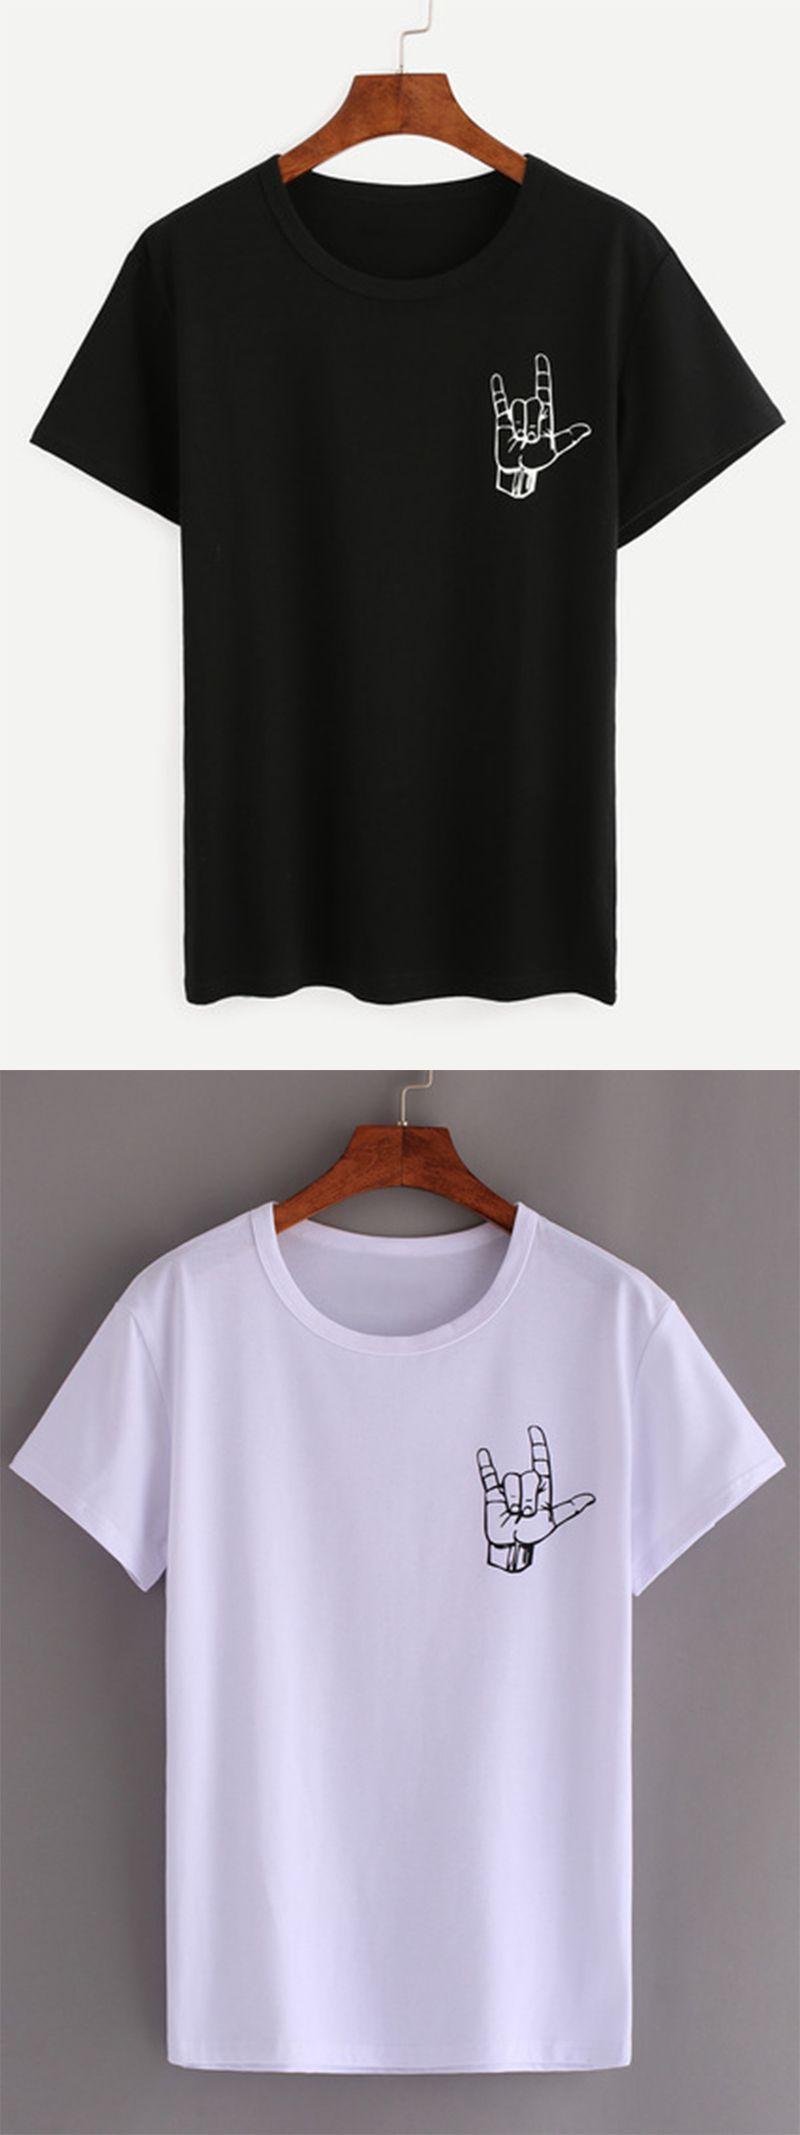 Black Love Gesture Print T-shirt … | Pinteres…